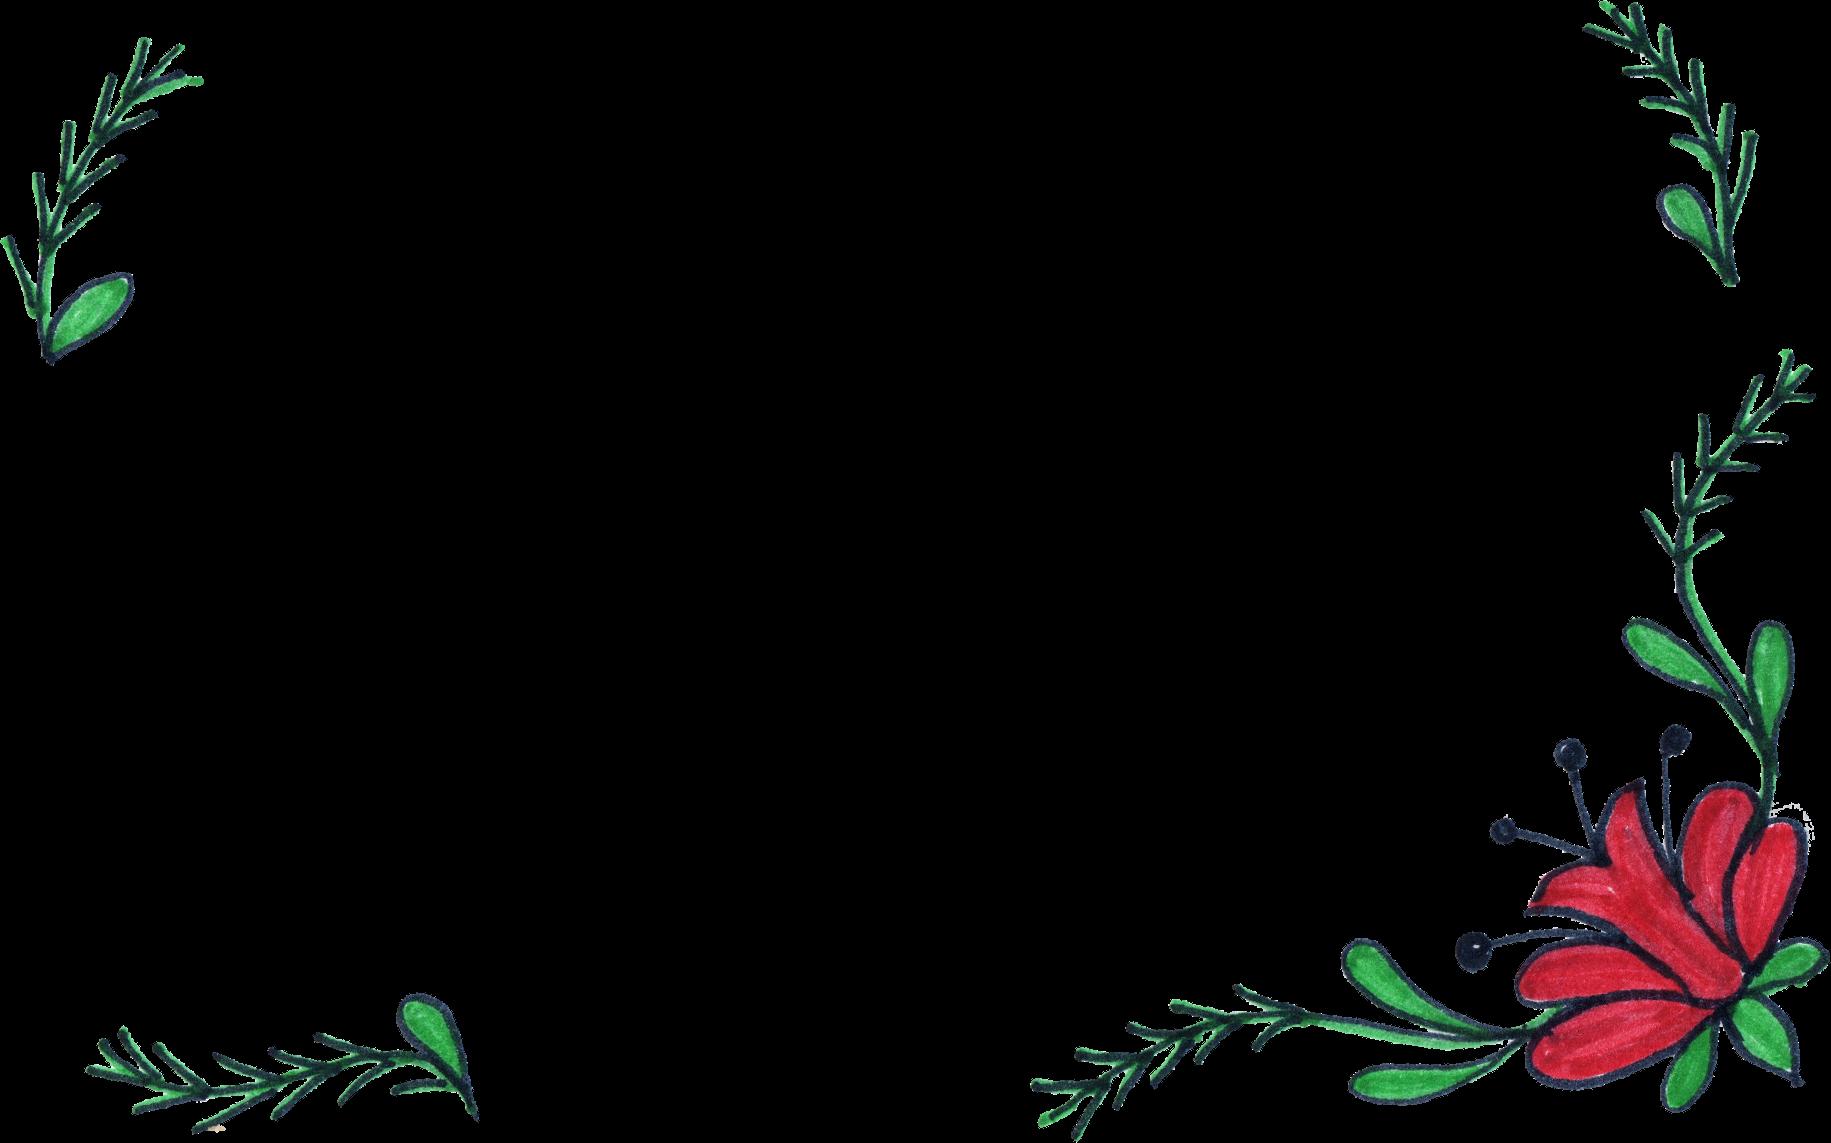 Flower Frame Line Drawing : Flower frame drawing png transparent onlygfx